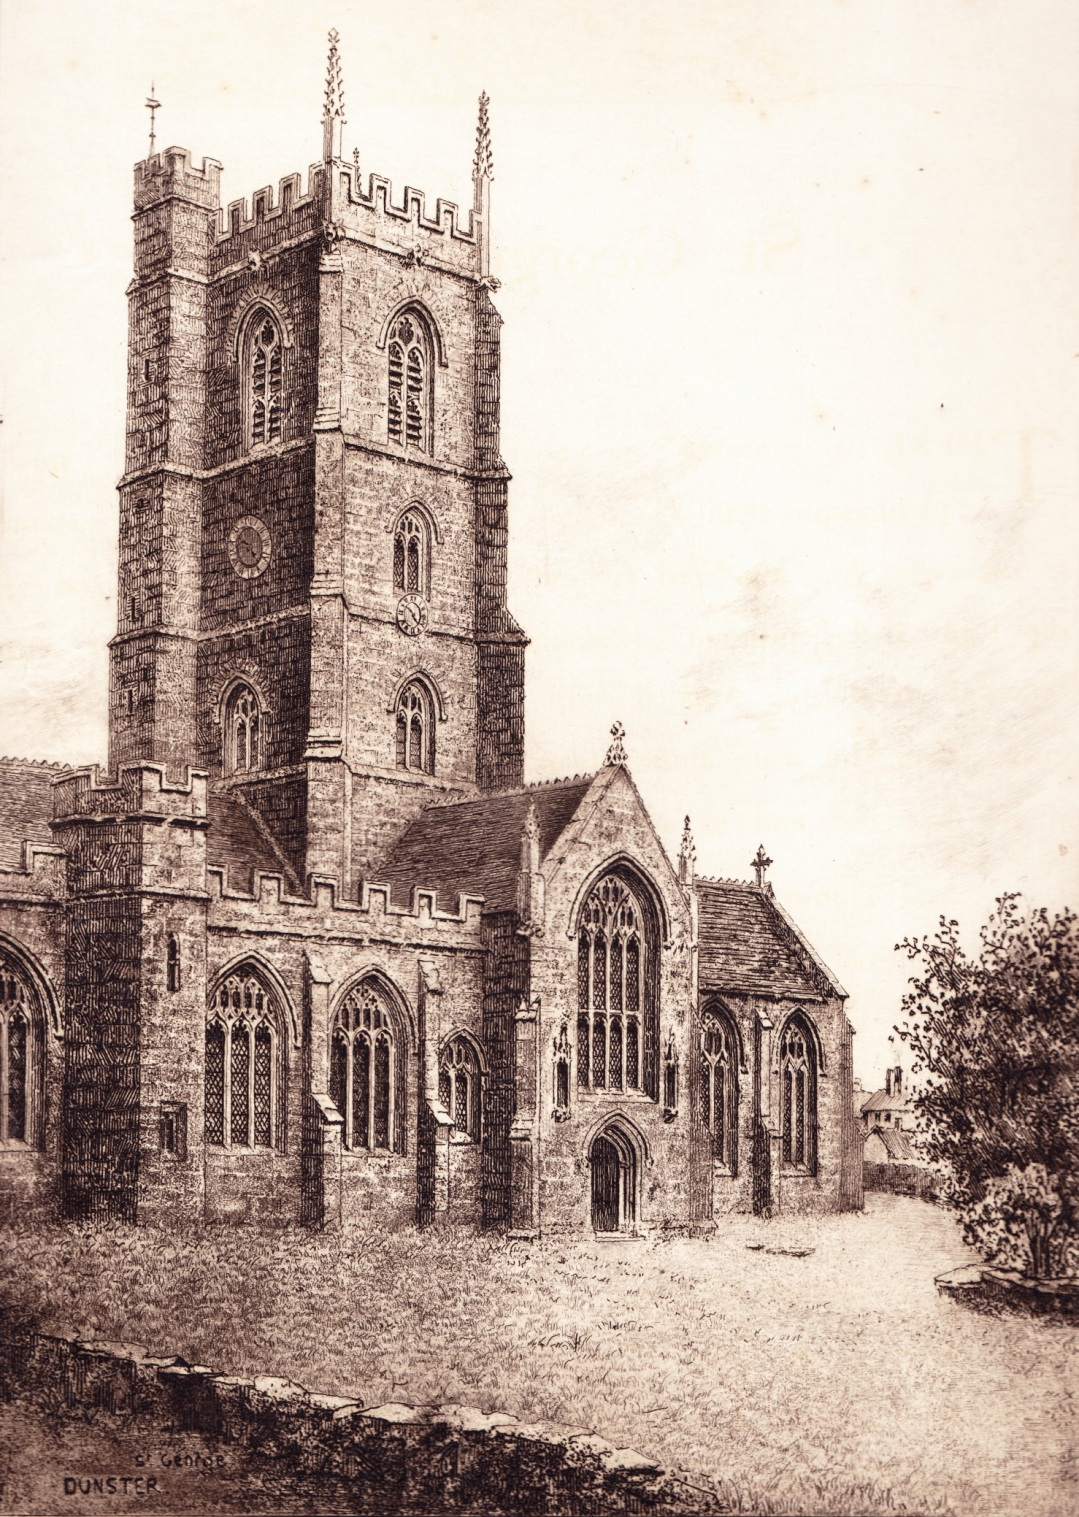 St George, Dunster by Elizabeth Piper